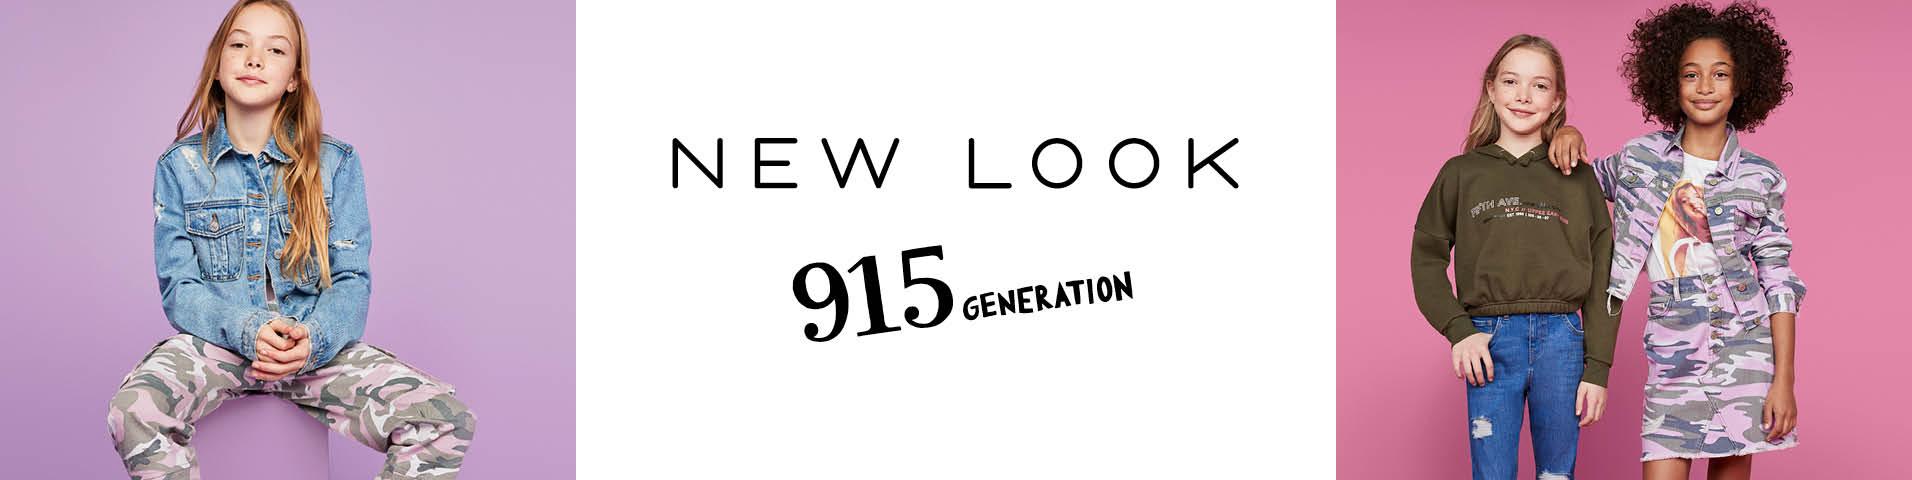 Kinderkleding Zalando.Outlet New Look 915 Generation Kinderkleding Zalando Ontdek Het